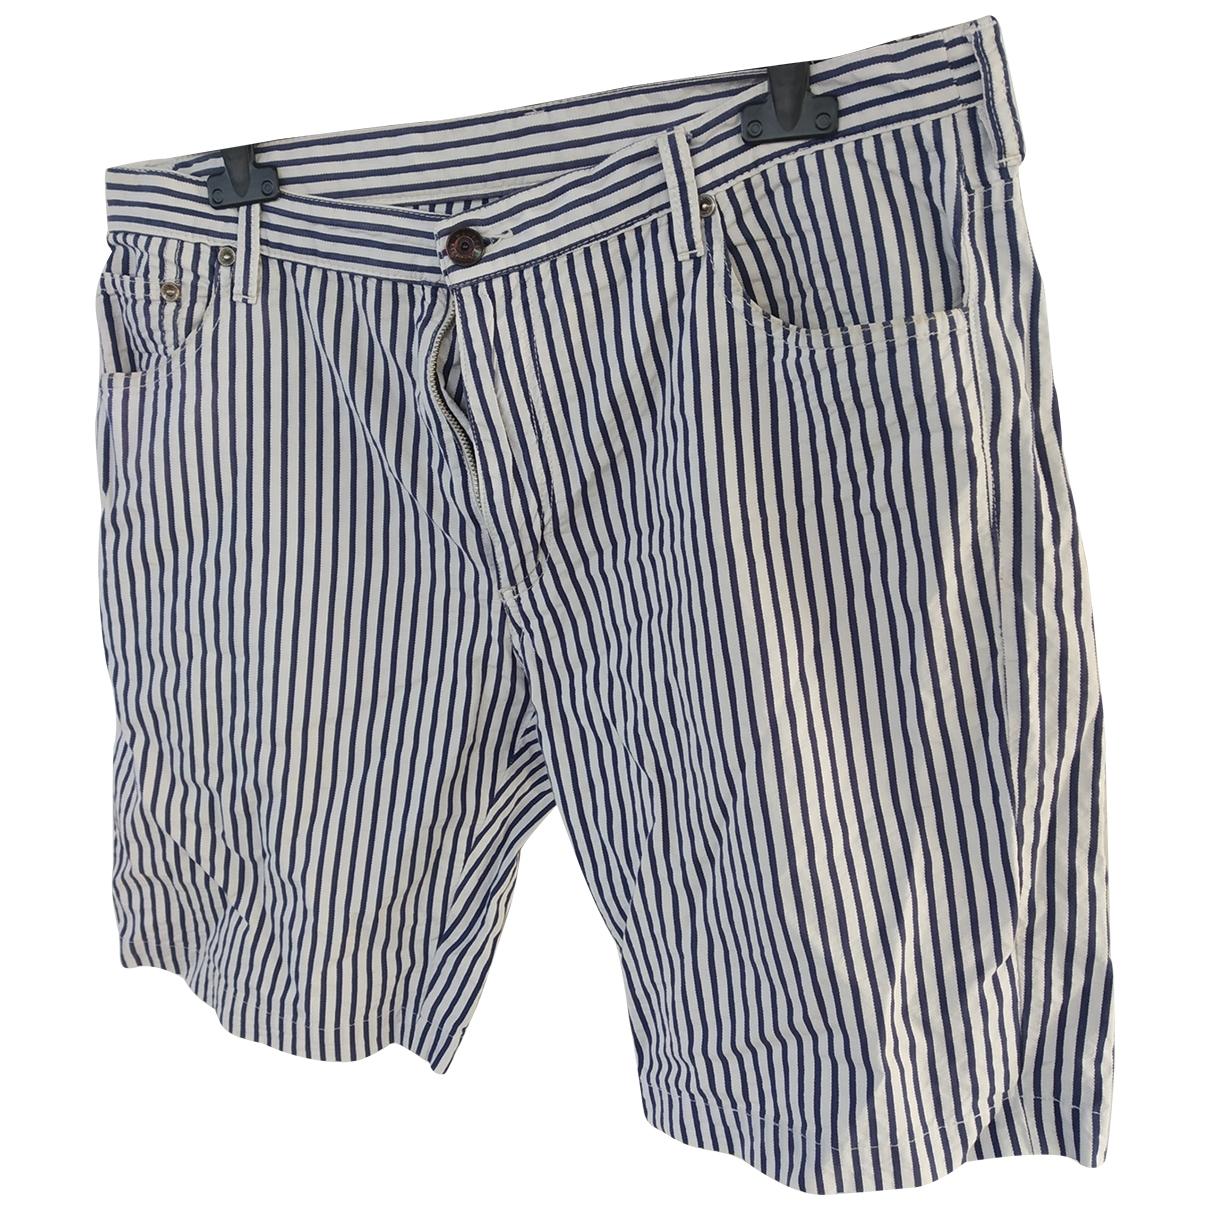 Marina Yachting \N Shorts in  Blau Baumwolle